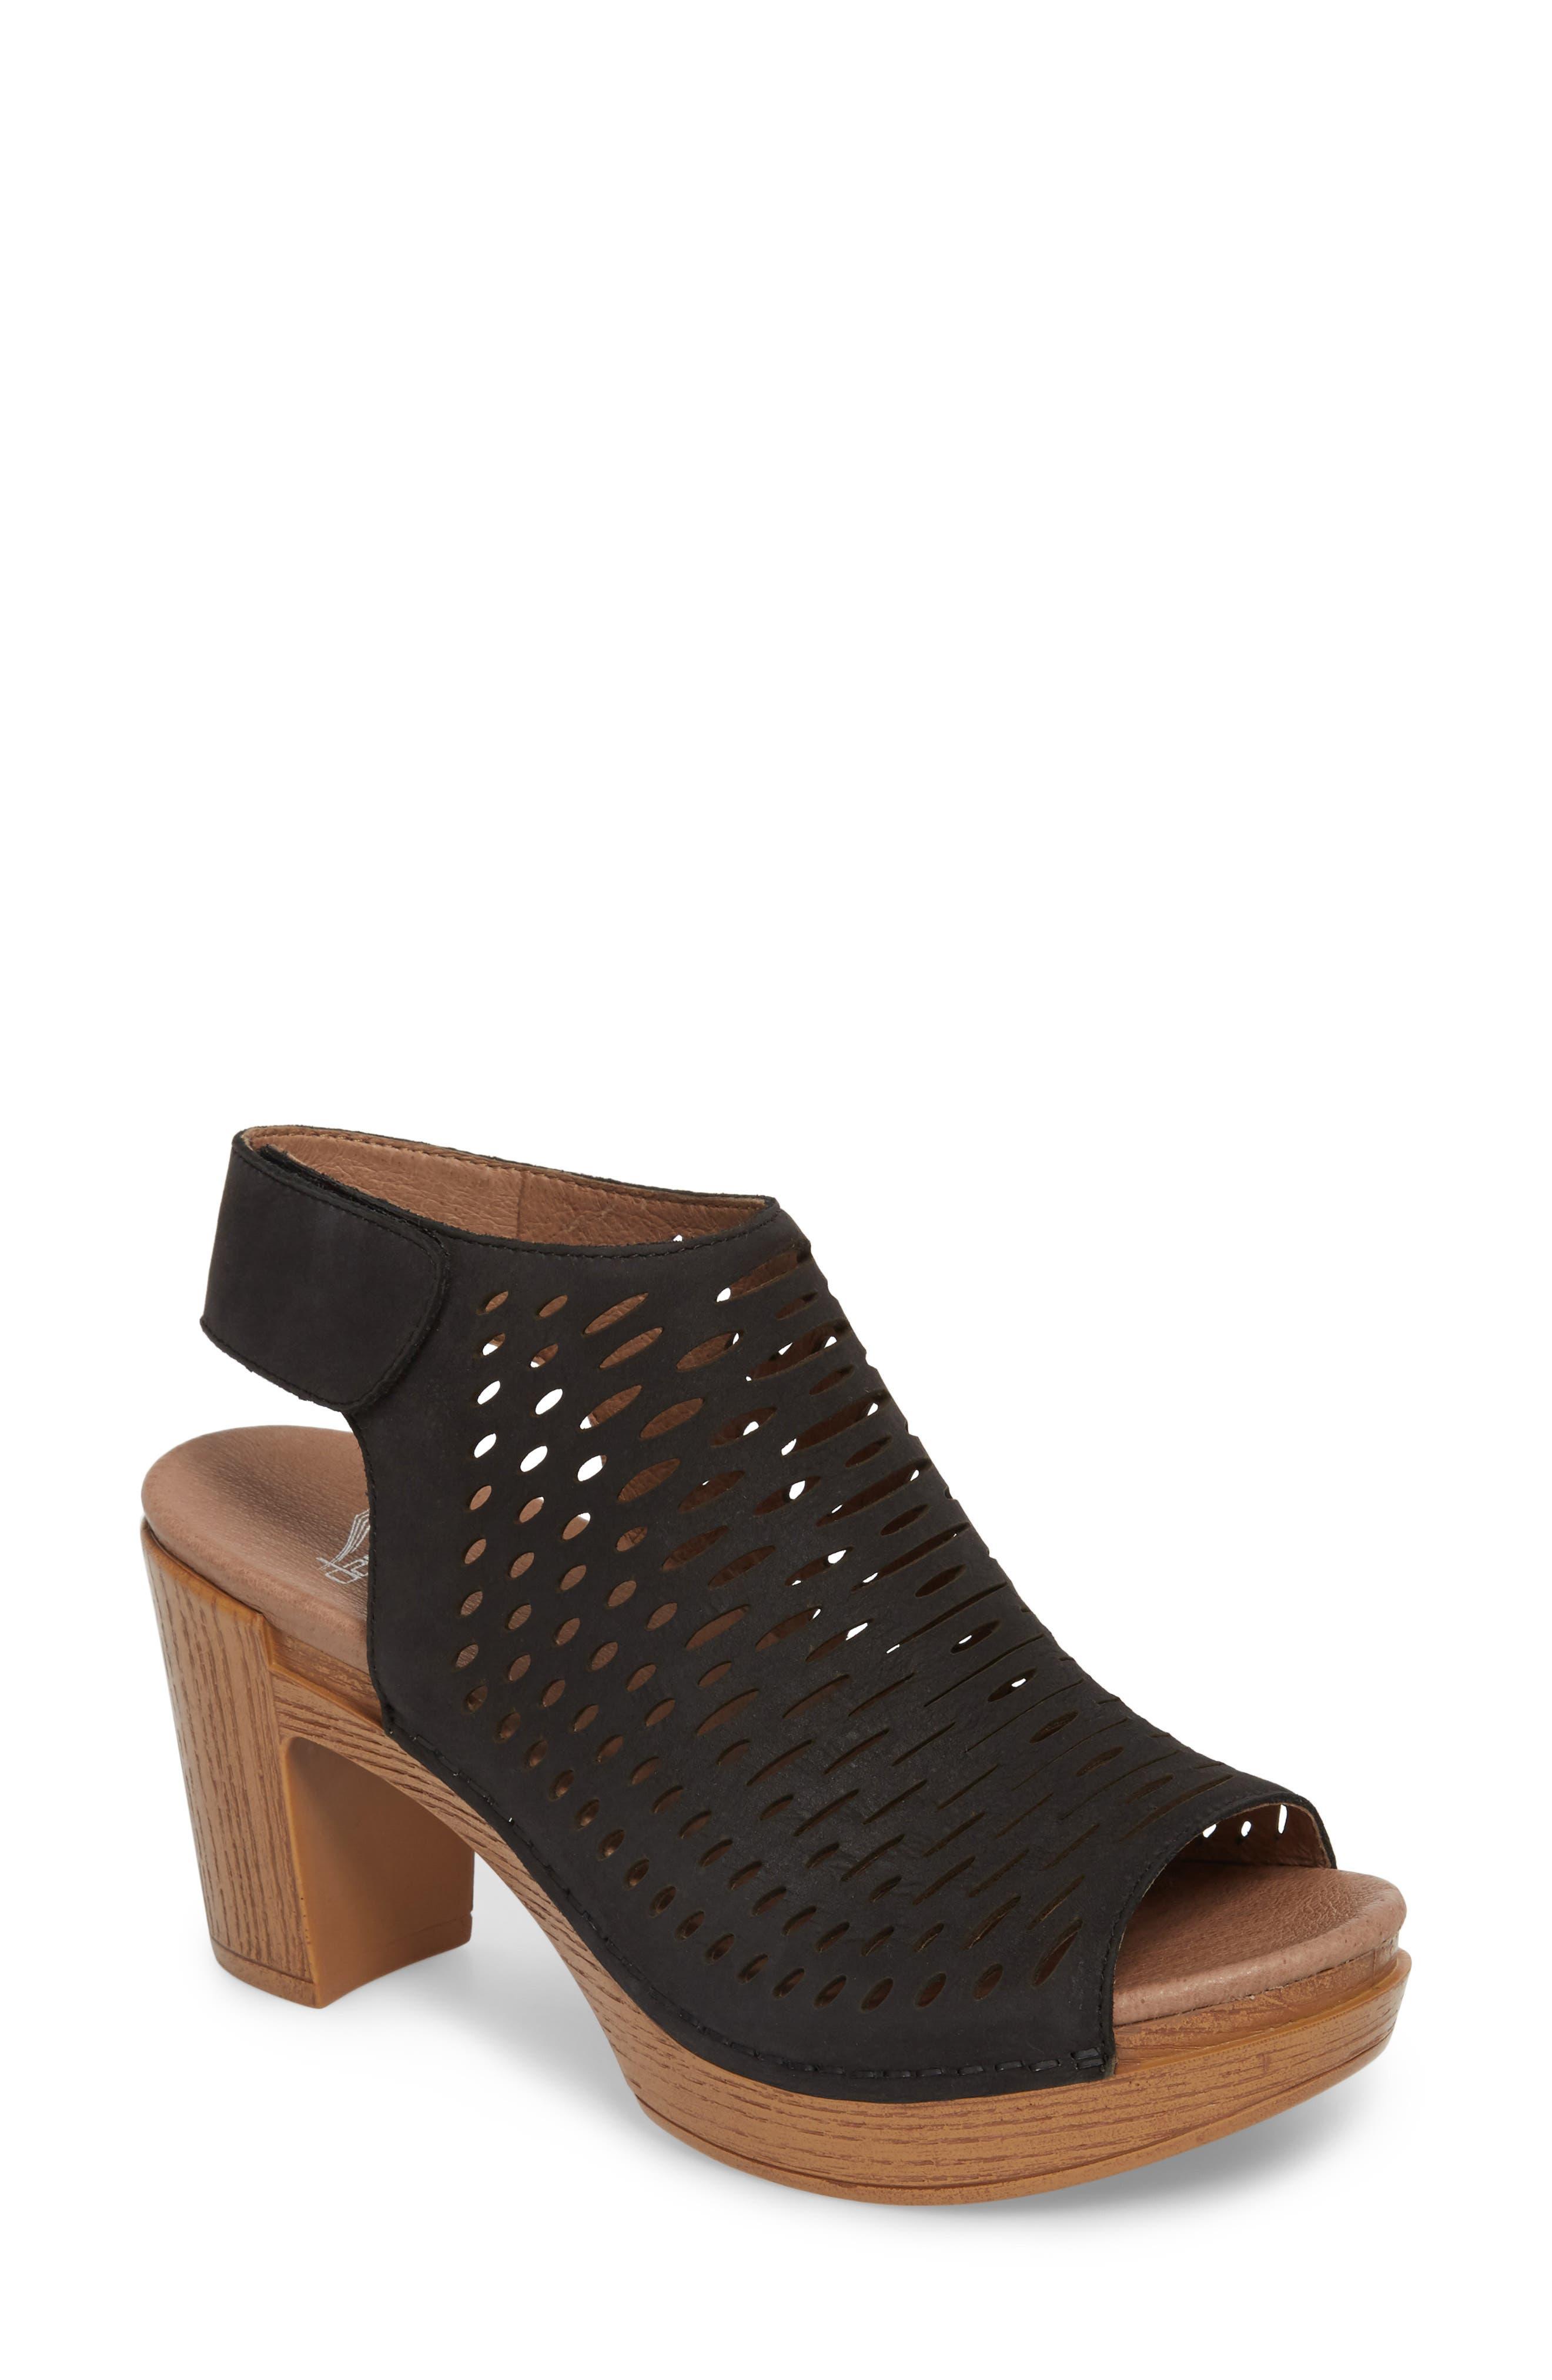 Dansko Danae Block Heel Sandal (Women)